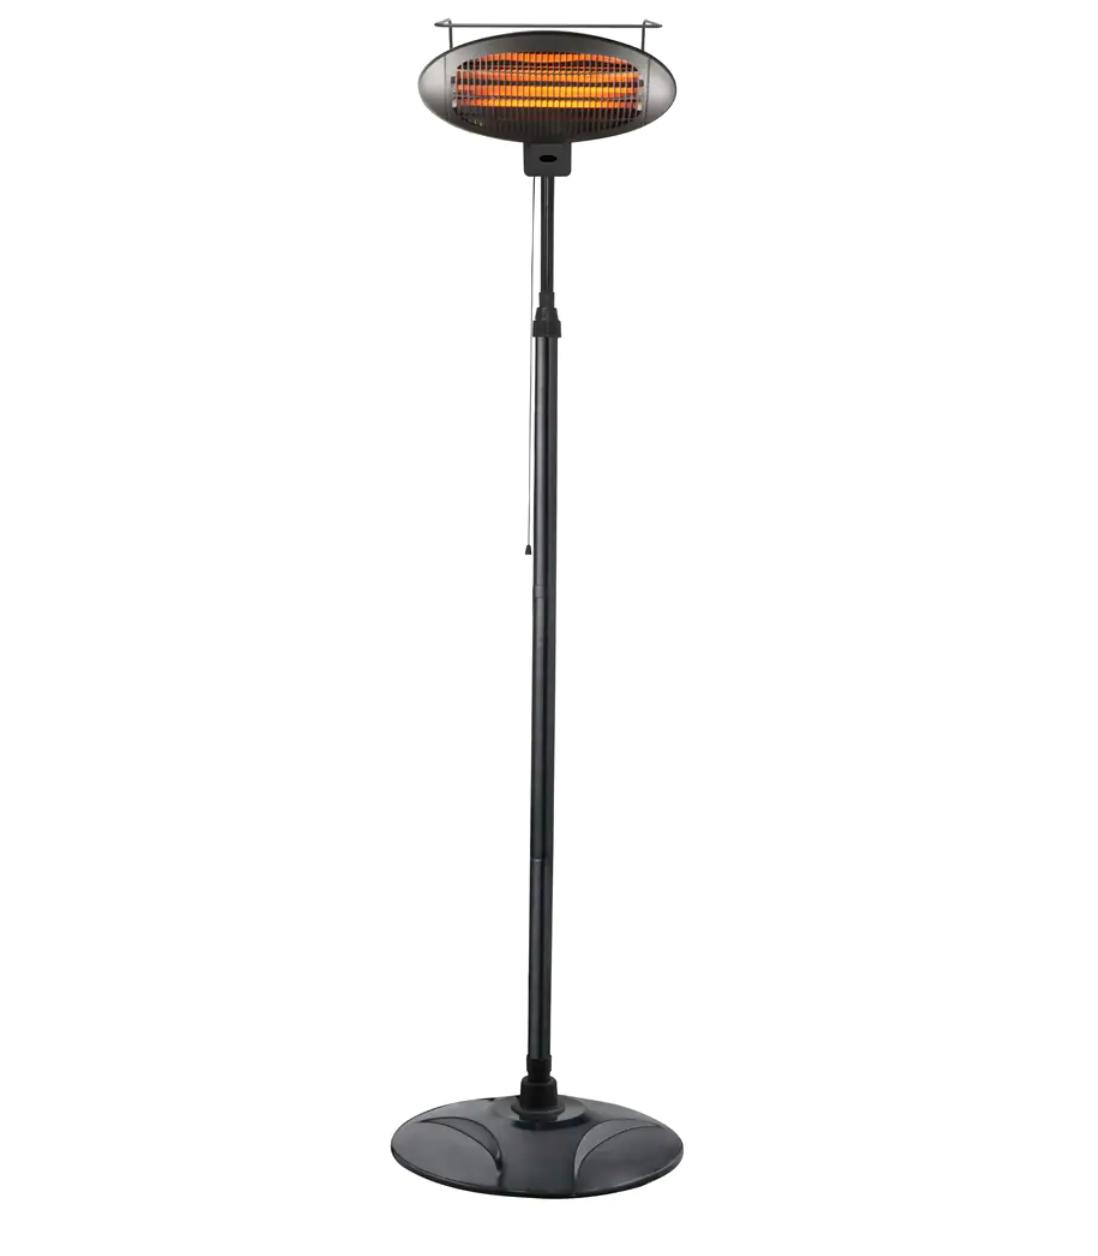 AZ Patio Heaters Promotional Electric Heater